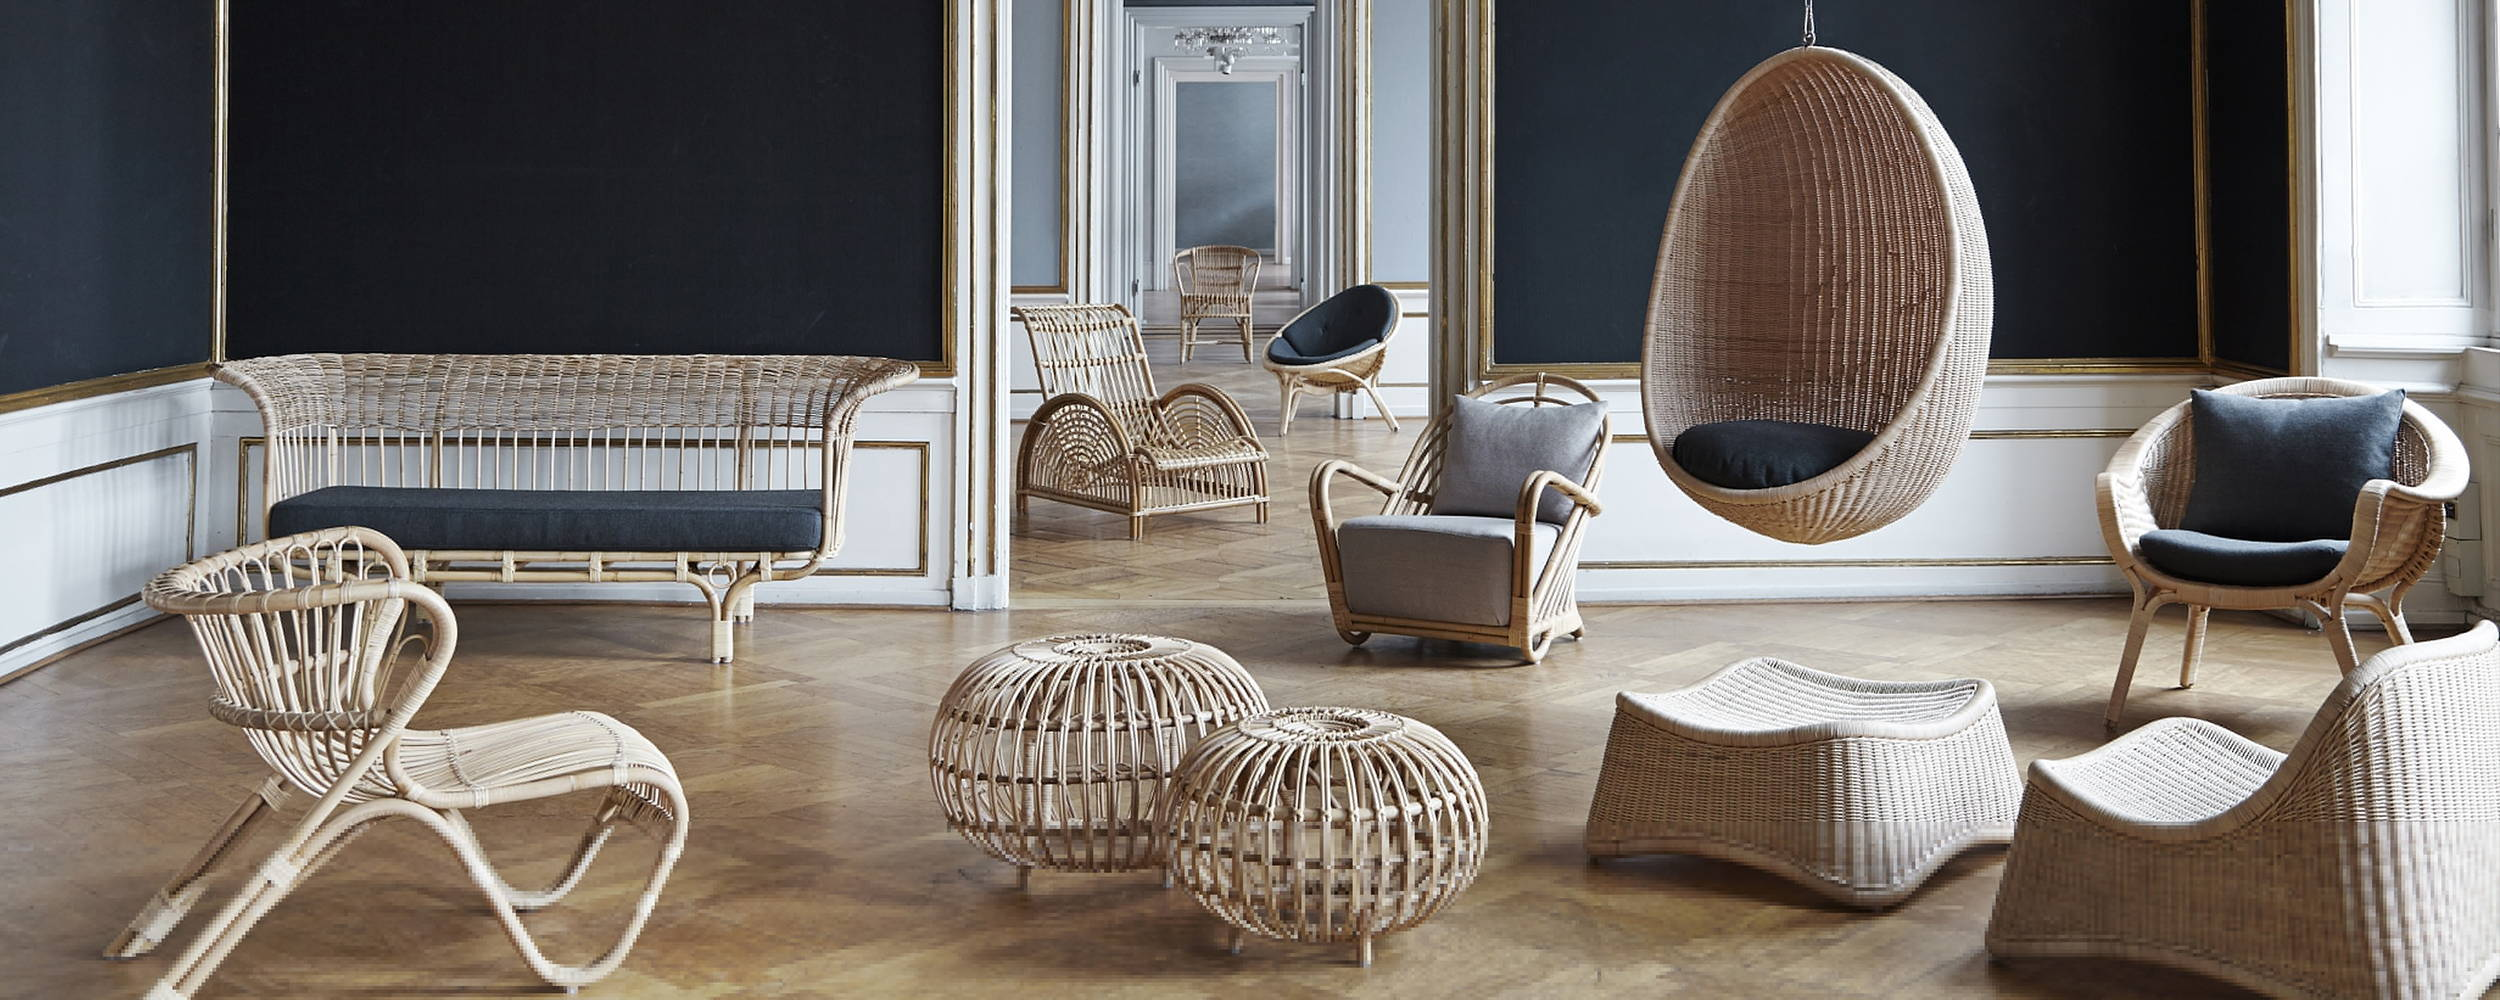 Contract Furniture, Lighting U0026 Decor | Restaurant, Hotels, Bars, Cafés | Contract  Furniture Store